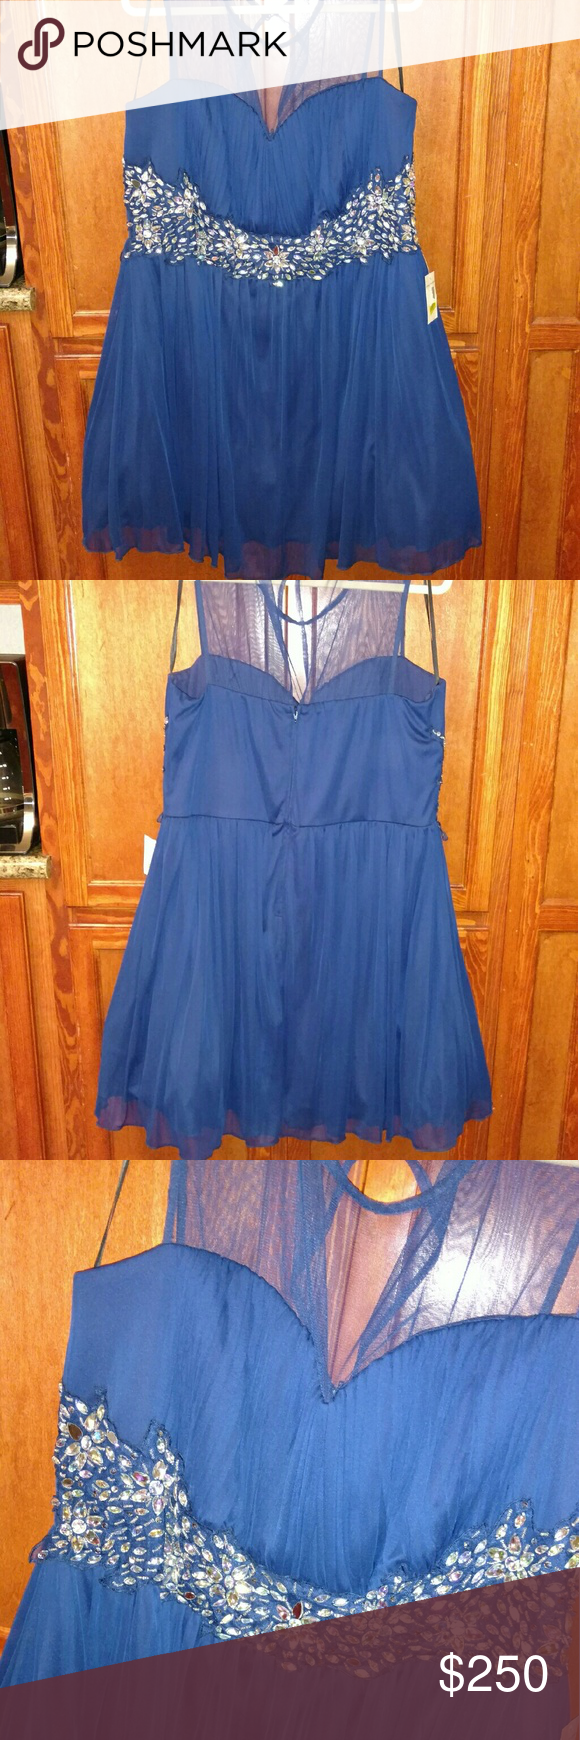 B darlin navy dress with jem flower design flower designs dress